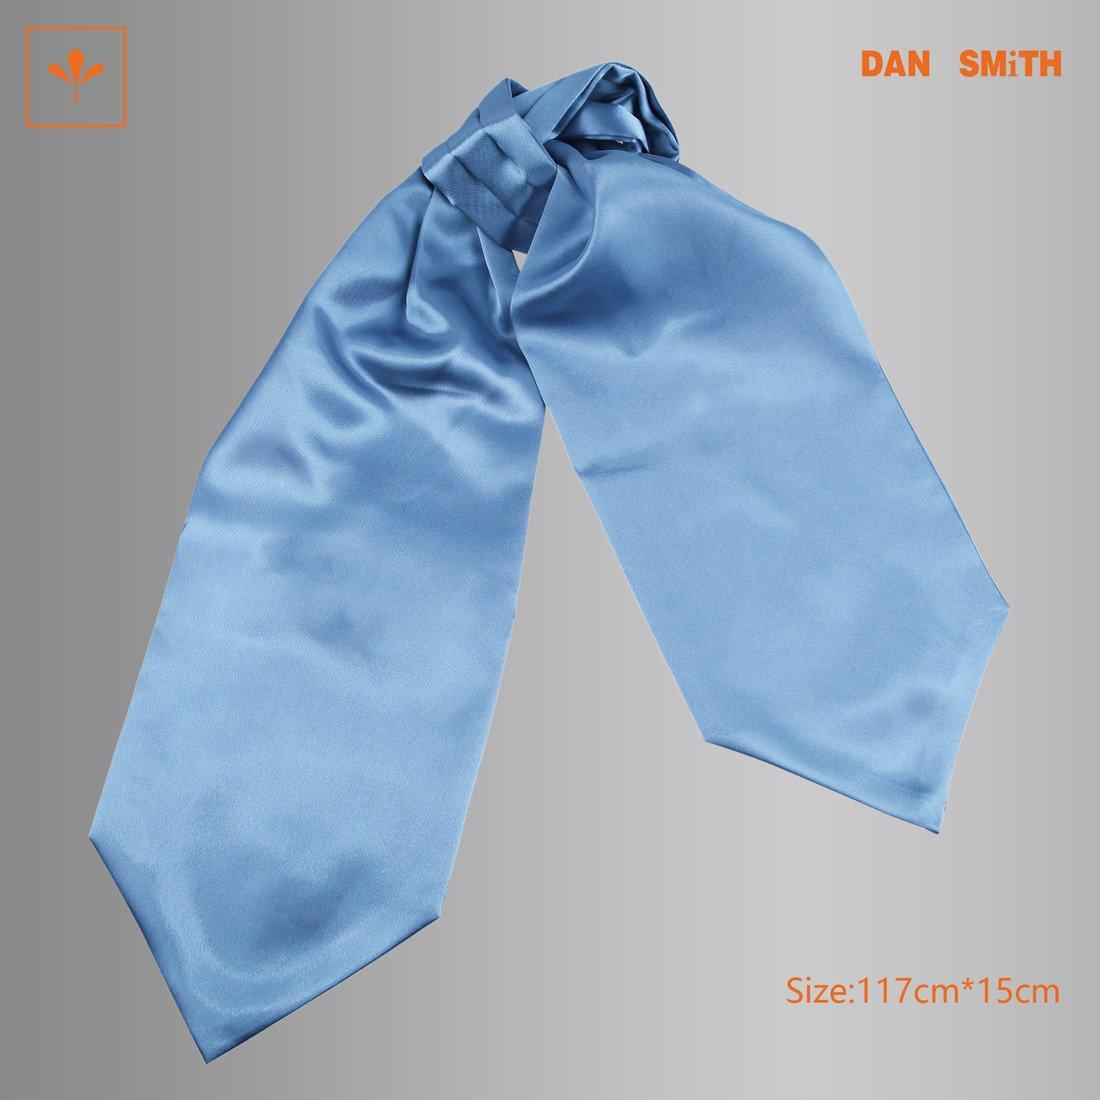 Steel Blue Solid Mens Cravat Ties Various Presents Idea Poly Excellent Fabric Ascot Work-utility Wedding Gift Dan Smith DRA7E01Q